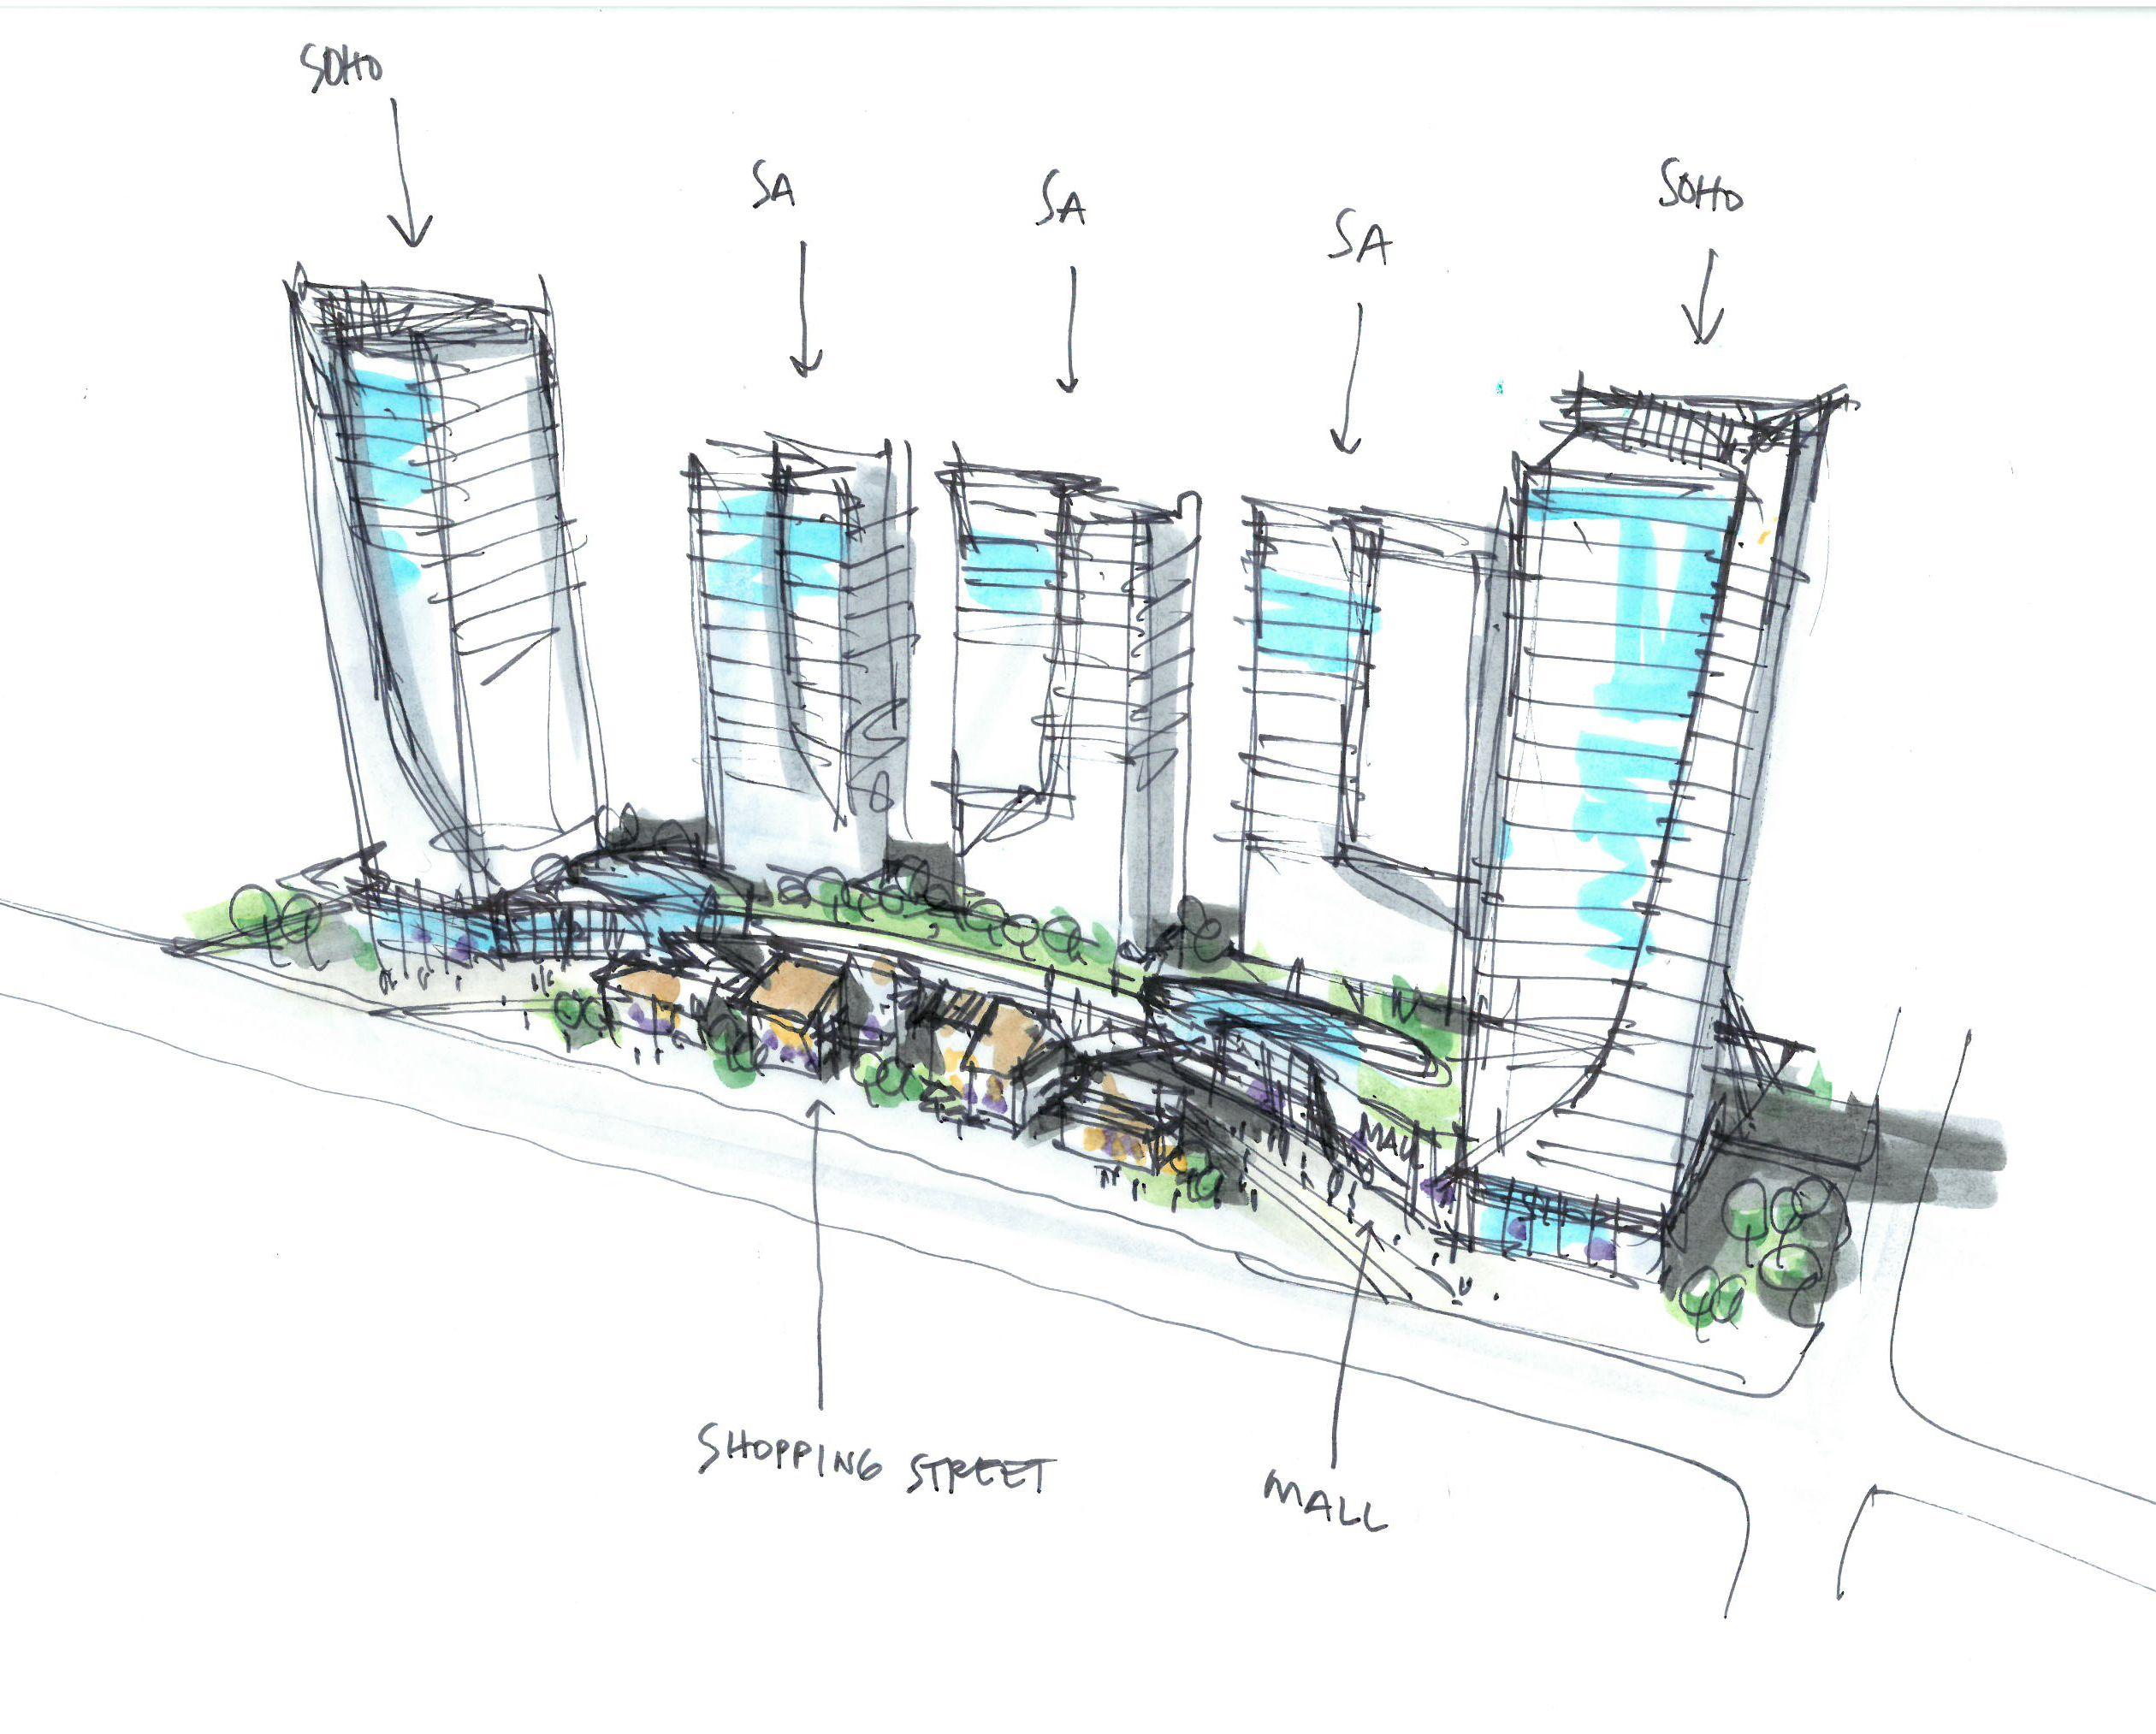 Mixed Use Concept_Randy Carizo | Architecture Sketches L Randy Carizo | Pinterest | Sketches ...